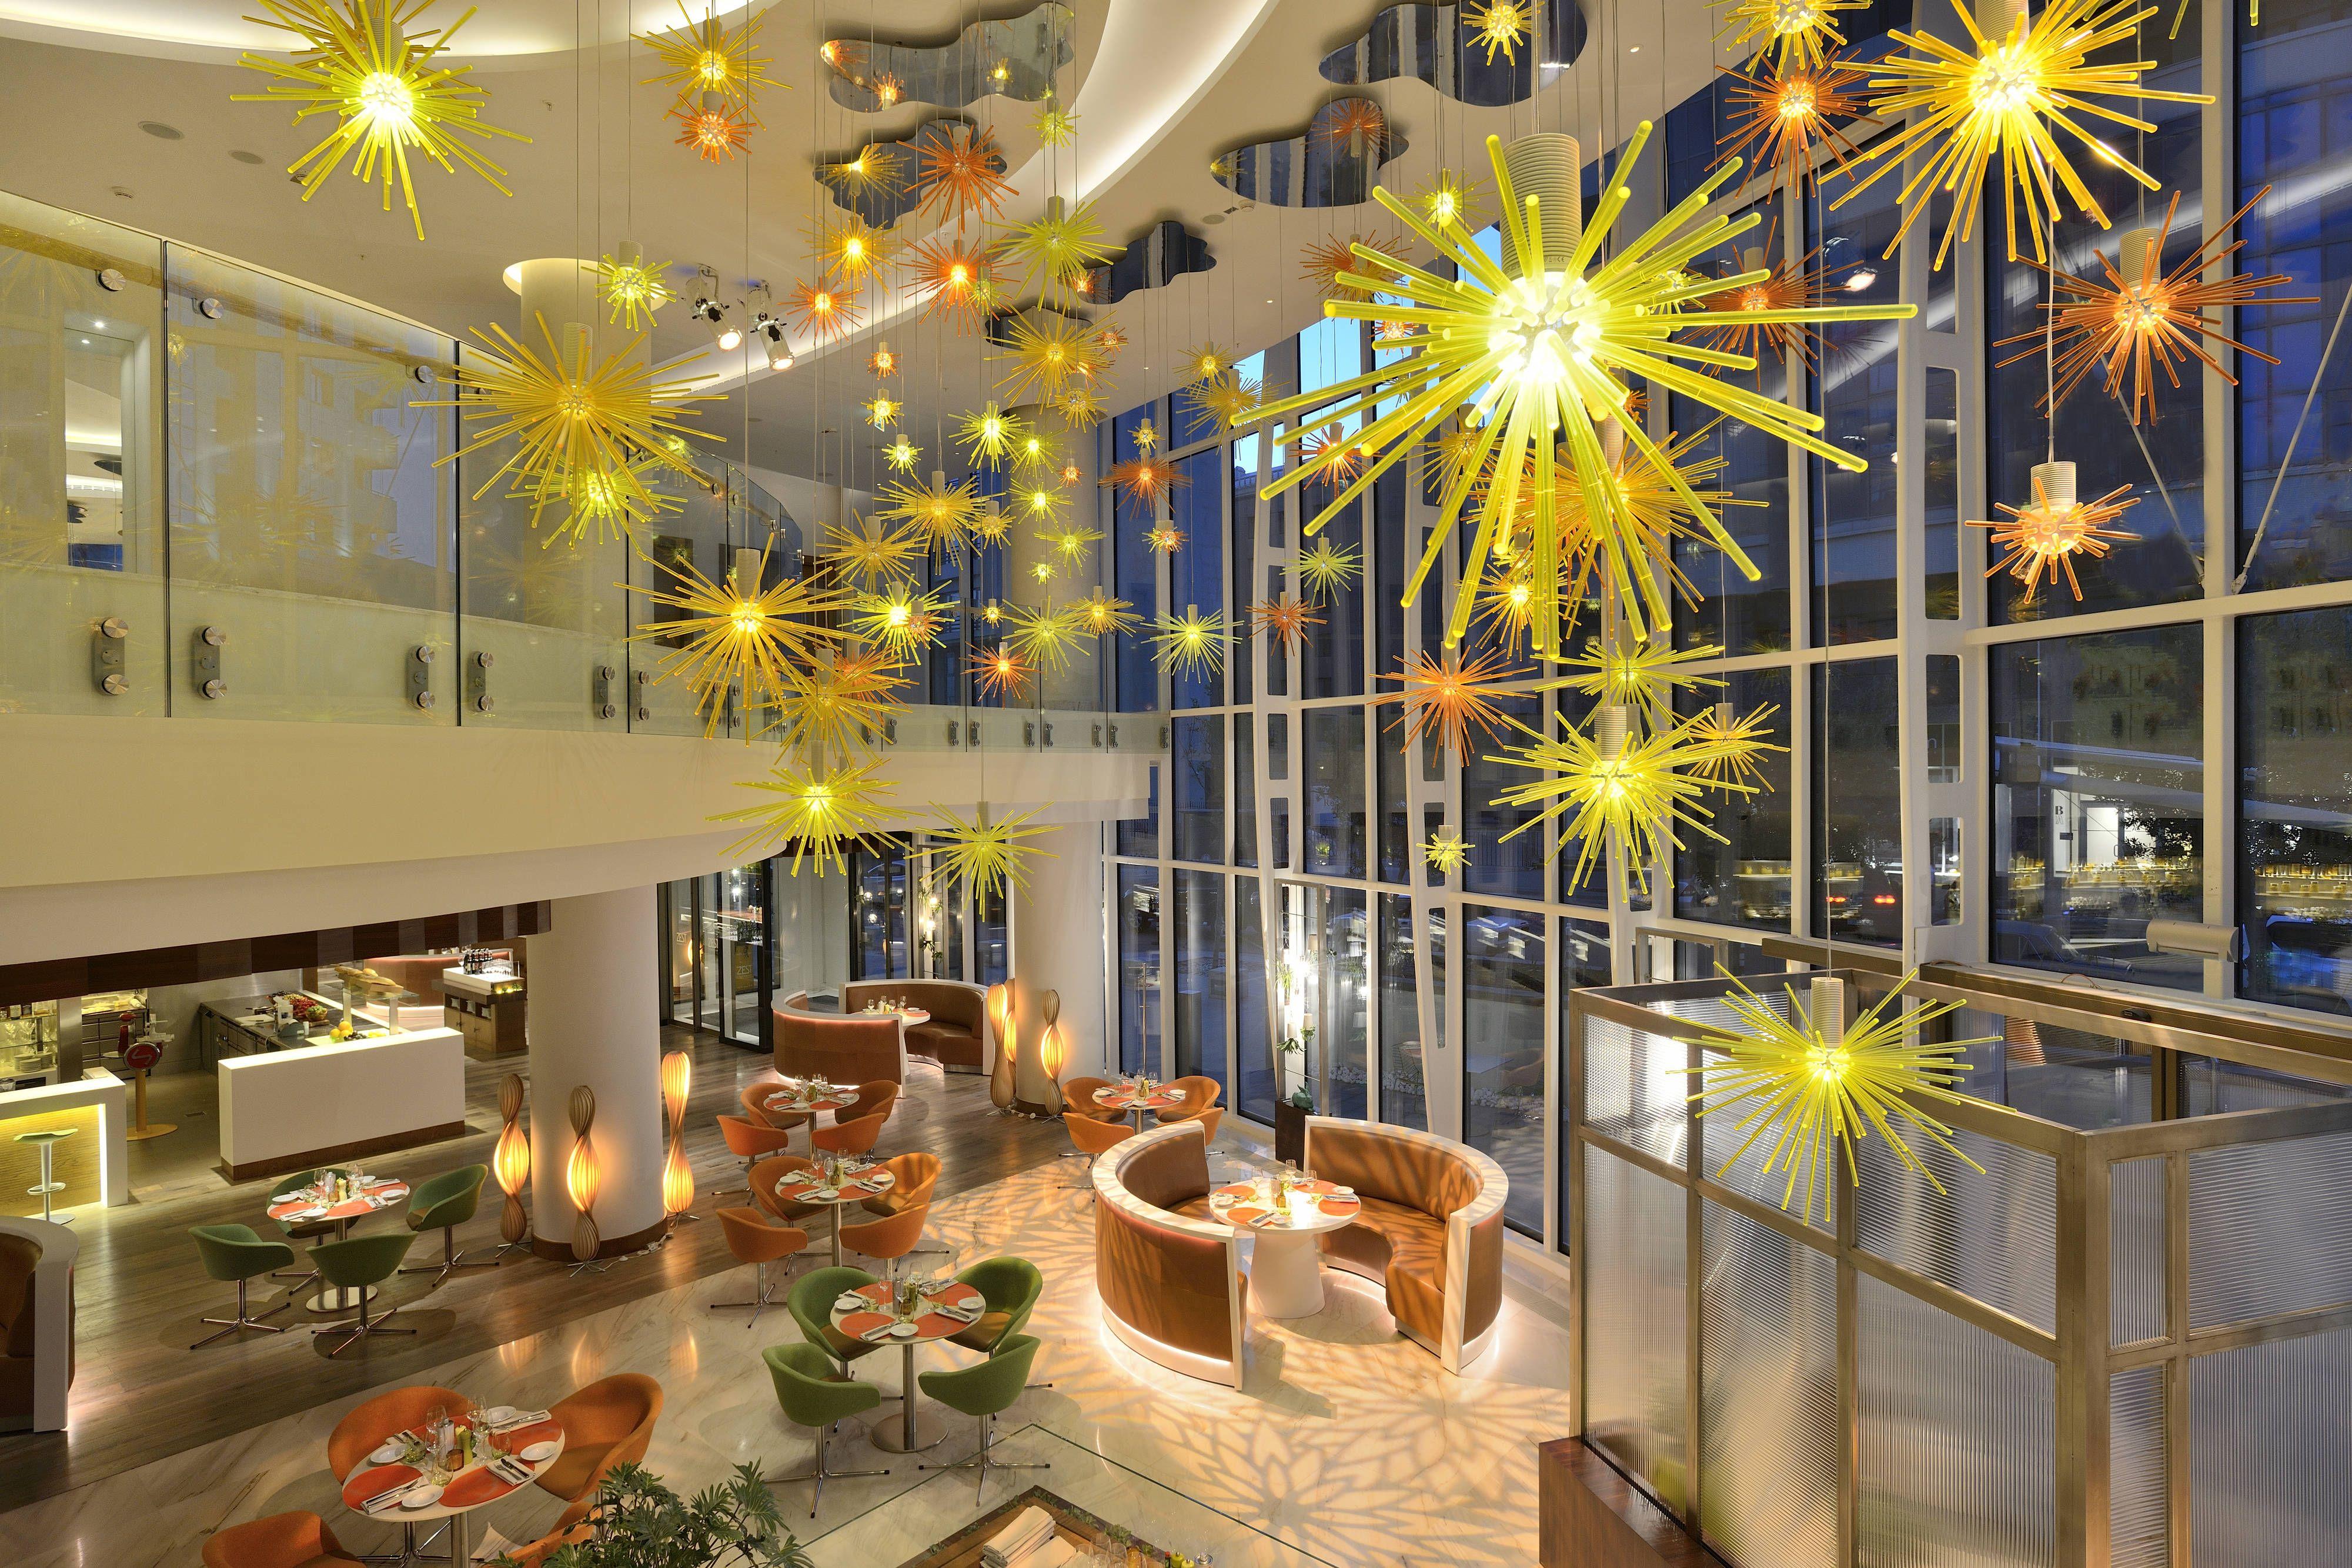 Jw Marriott Absheron Baku Zest Lifestyle Cafe Dining Area Guestroom Traveling Enjoy Colorful Interiors Dark Interiors Boutique Design